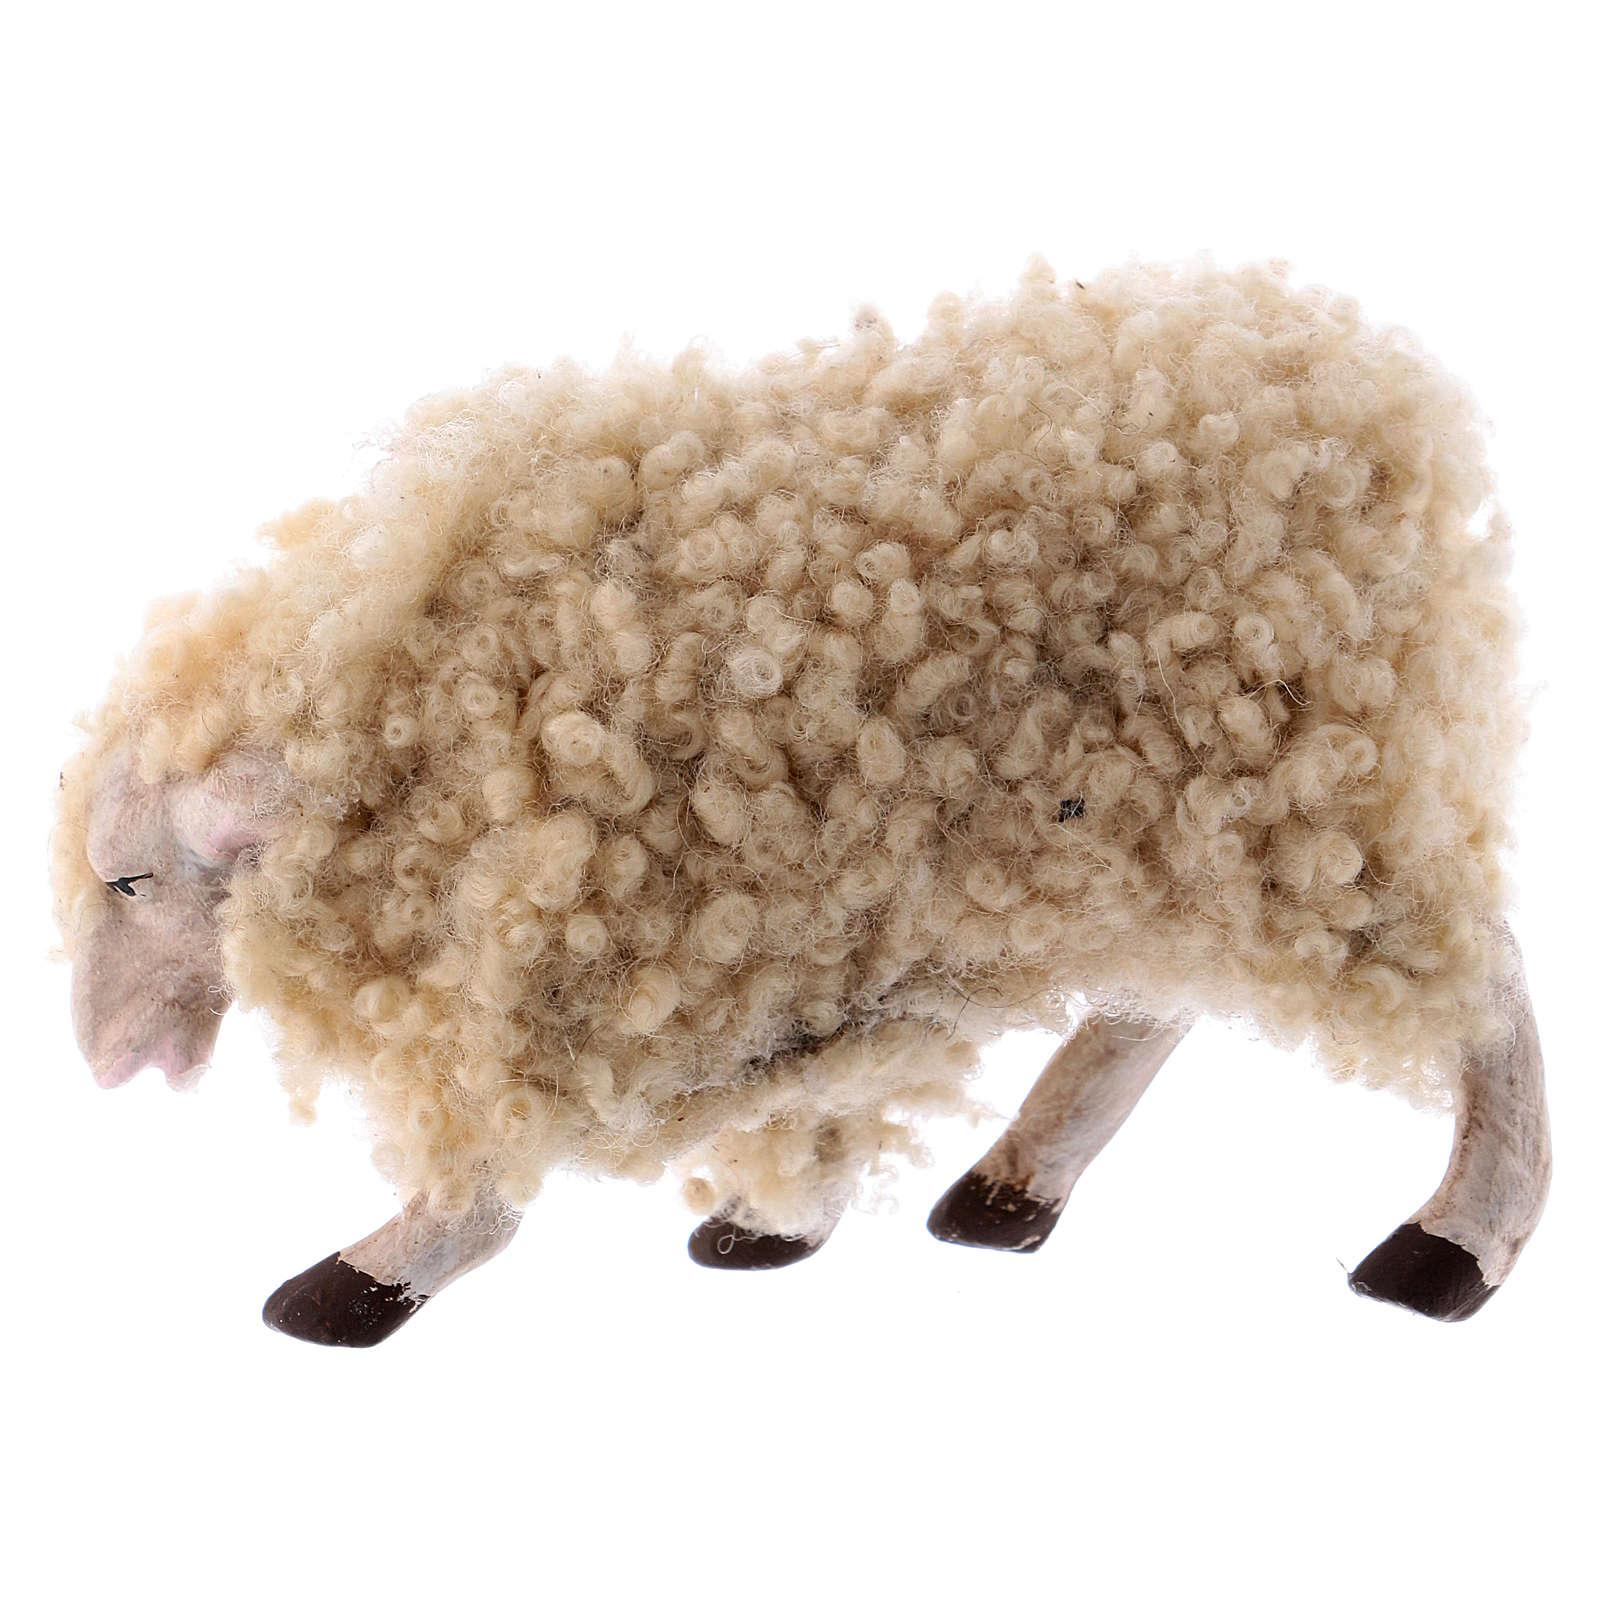 Kit 3 pecore con lana 18 cm presepe napoletano 4